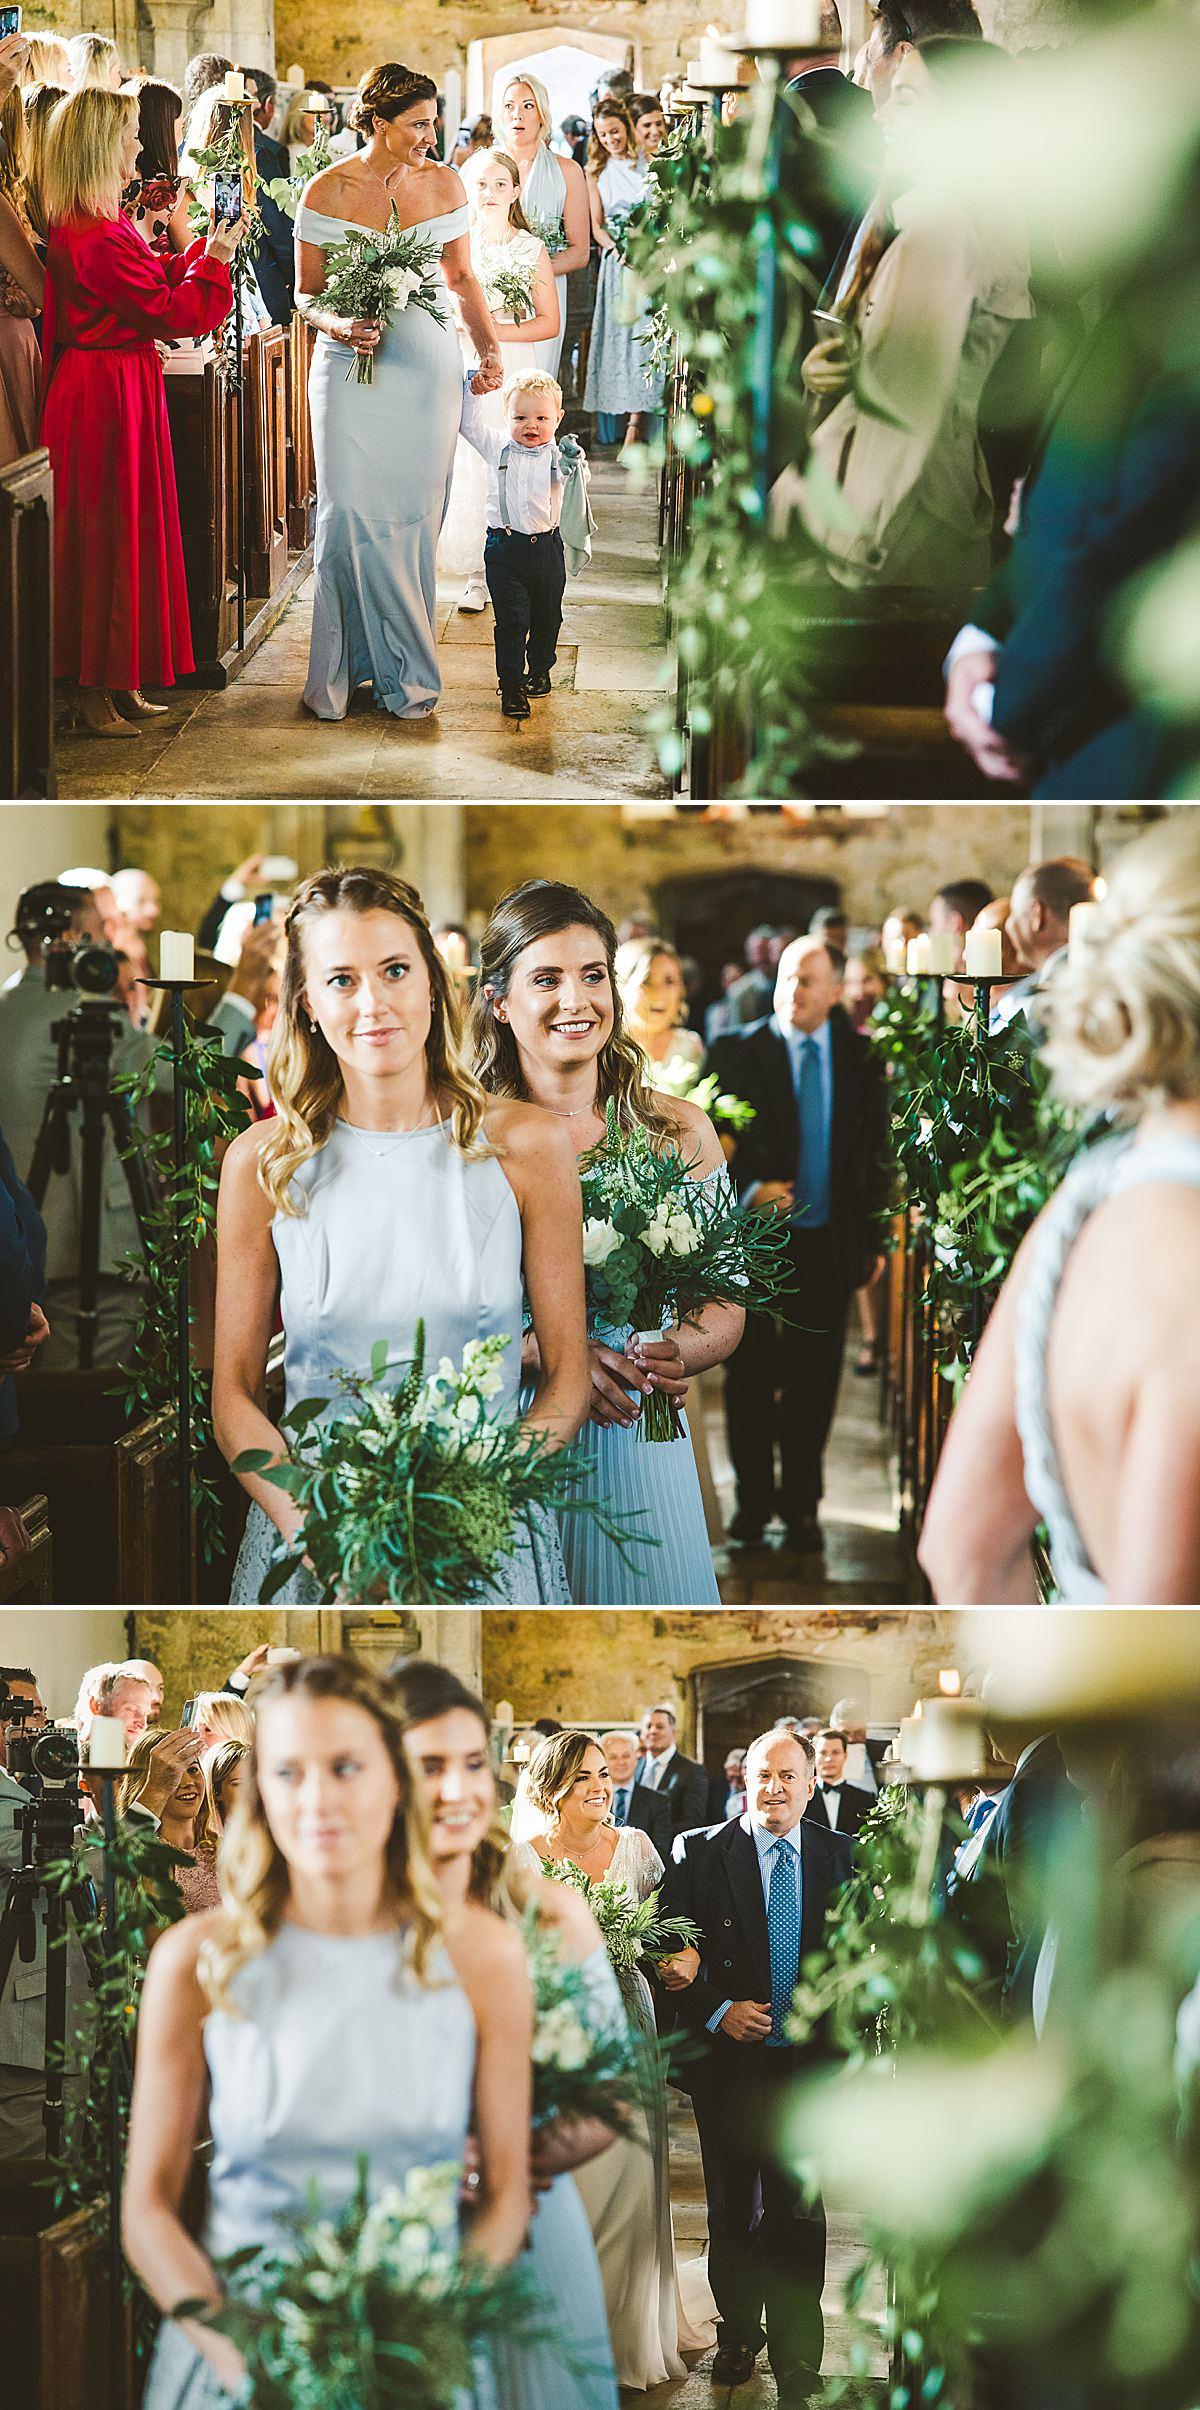 Lulworth Castle Church wedding photography